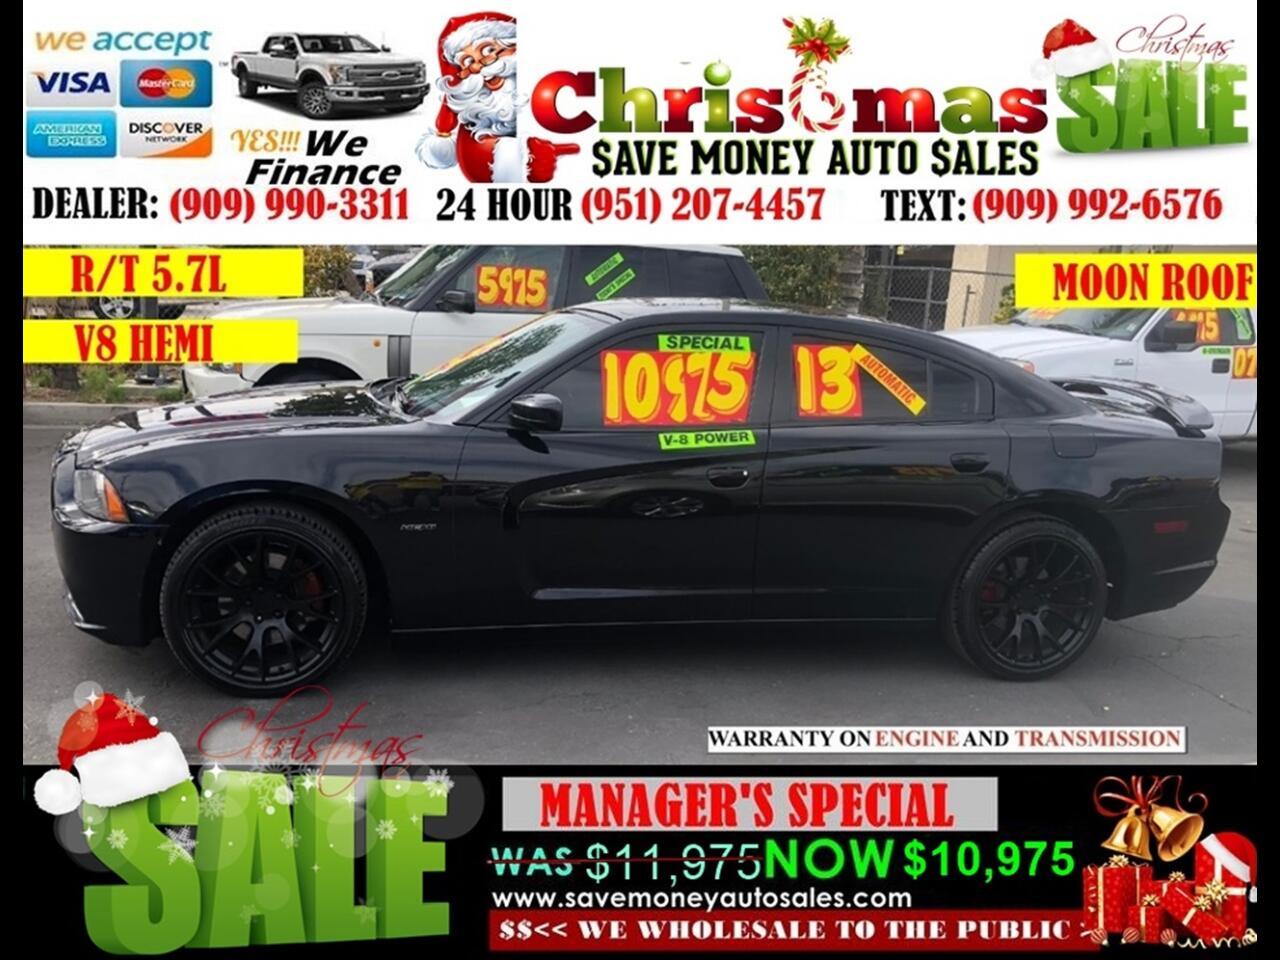 2013 Dodge Charger R/T>5.7L V8 HEMI, MOON ROOF